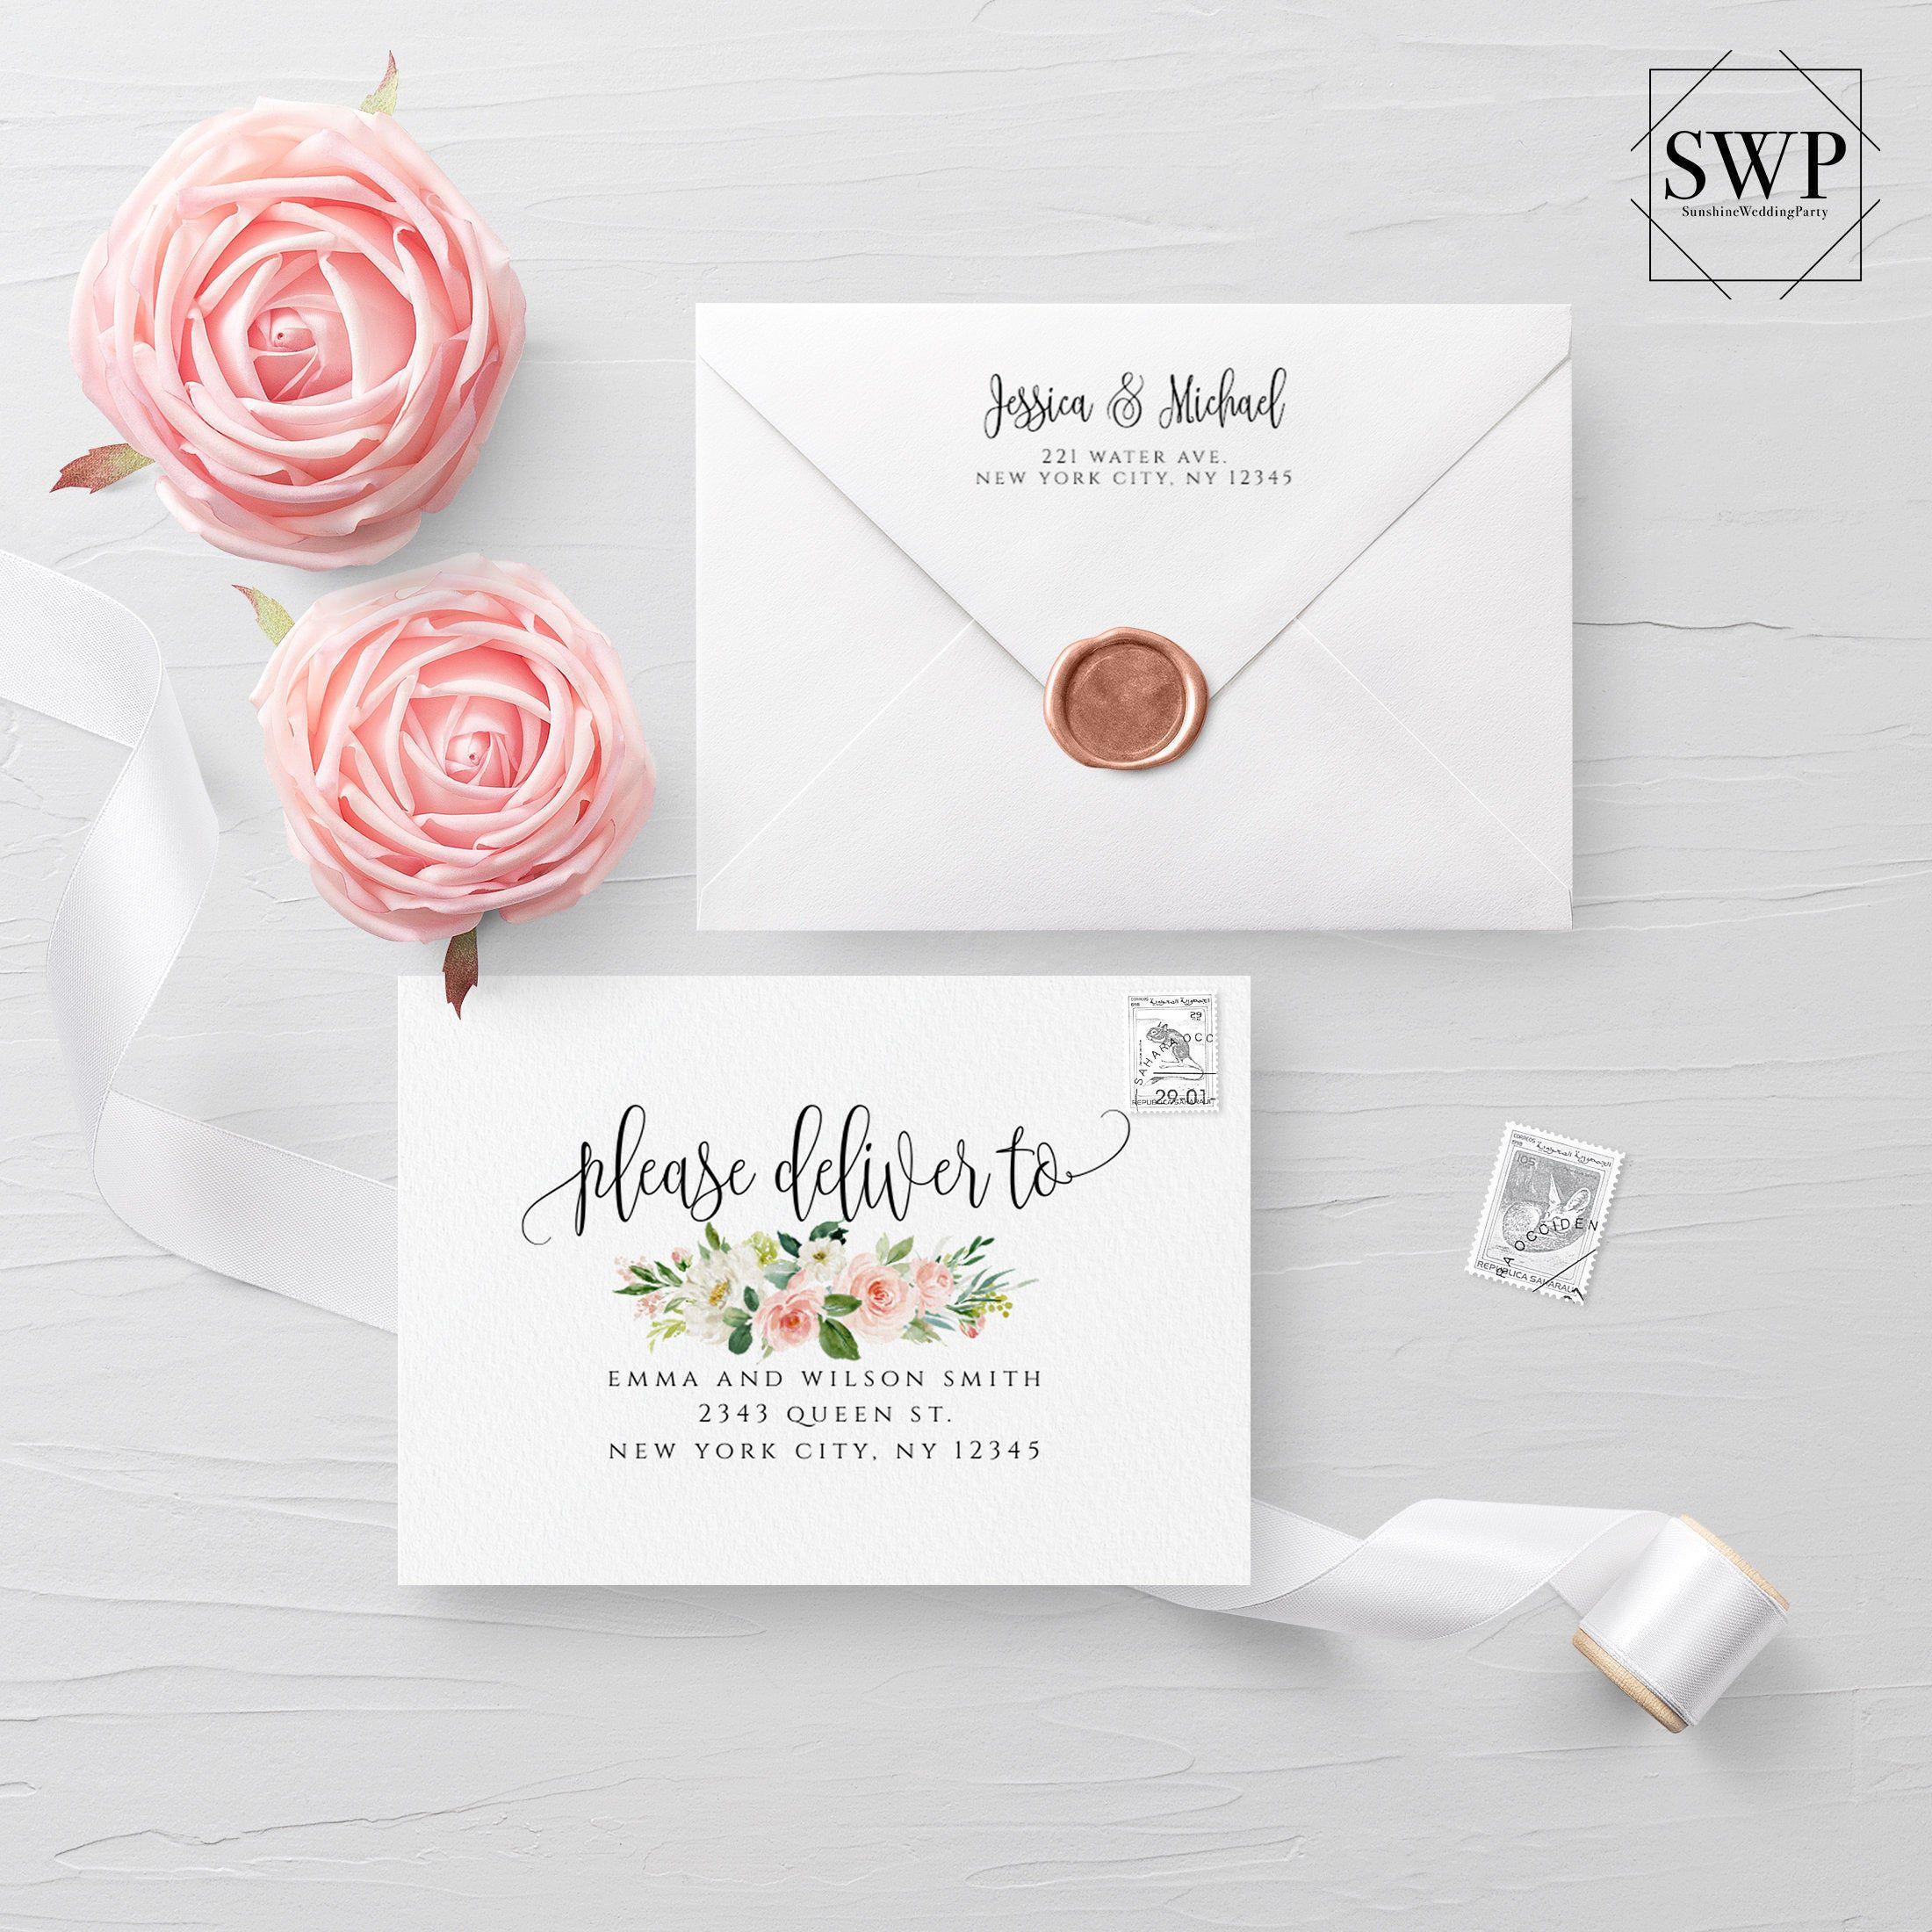 Floral Envelope Template Wedding Editable Diy Printable Wedding Envelope A7 A6 A1 Envelope Address Template Instant Download Templett F5 Printable Wedding Envelopes Wedding Templates Envelope Addressing Template